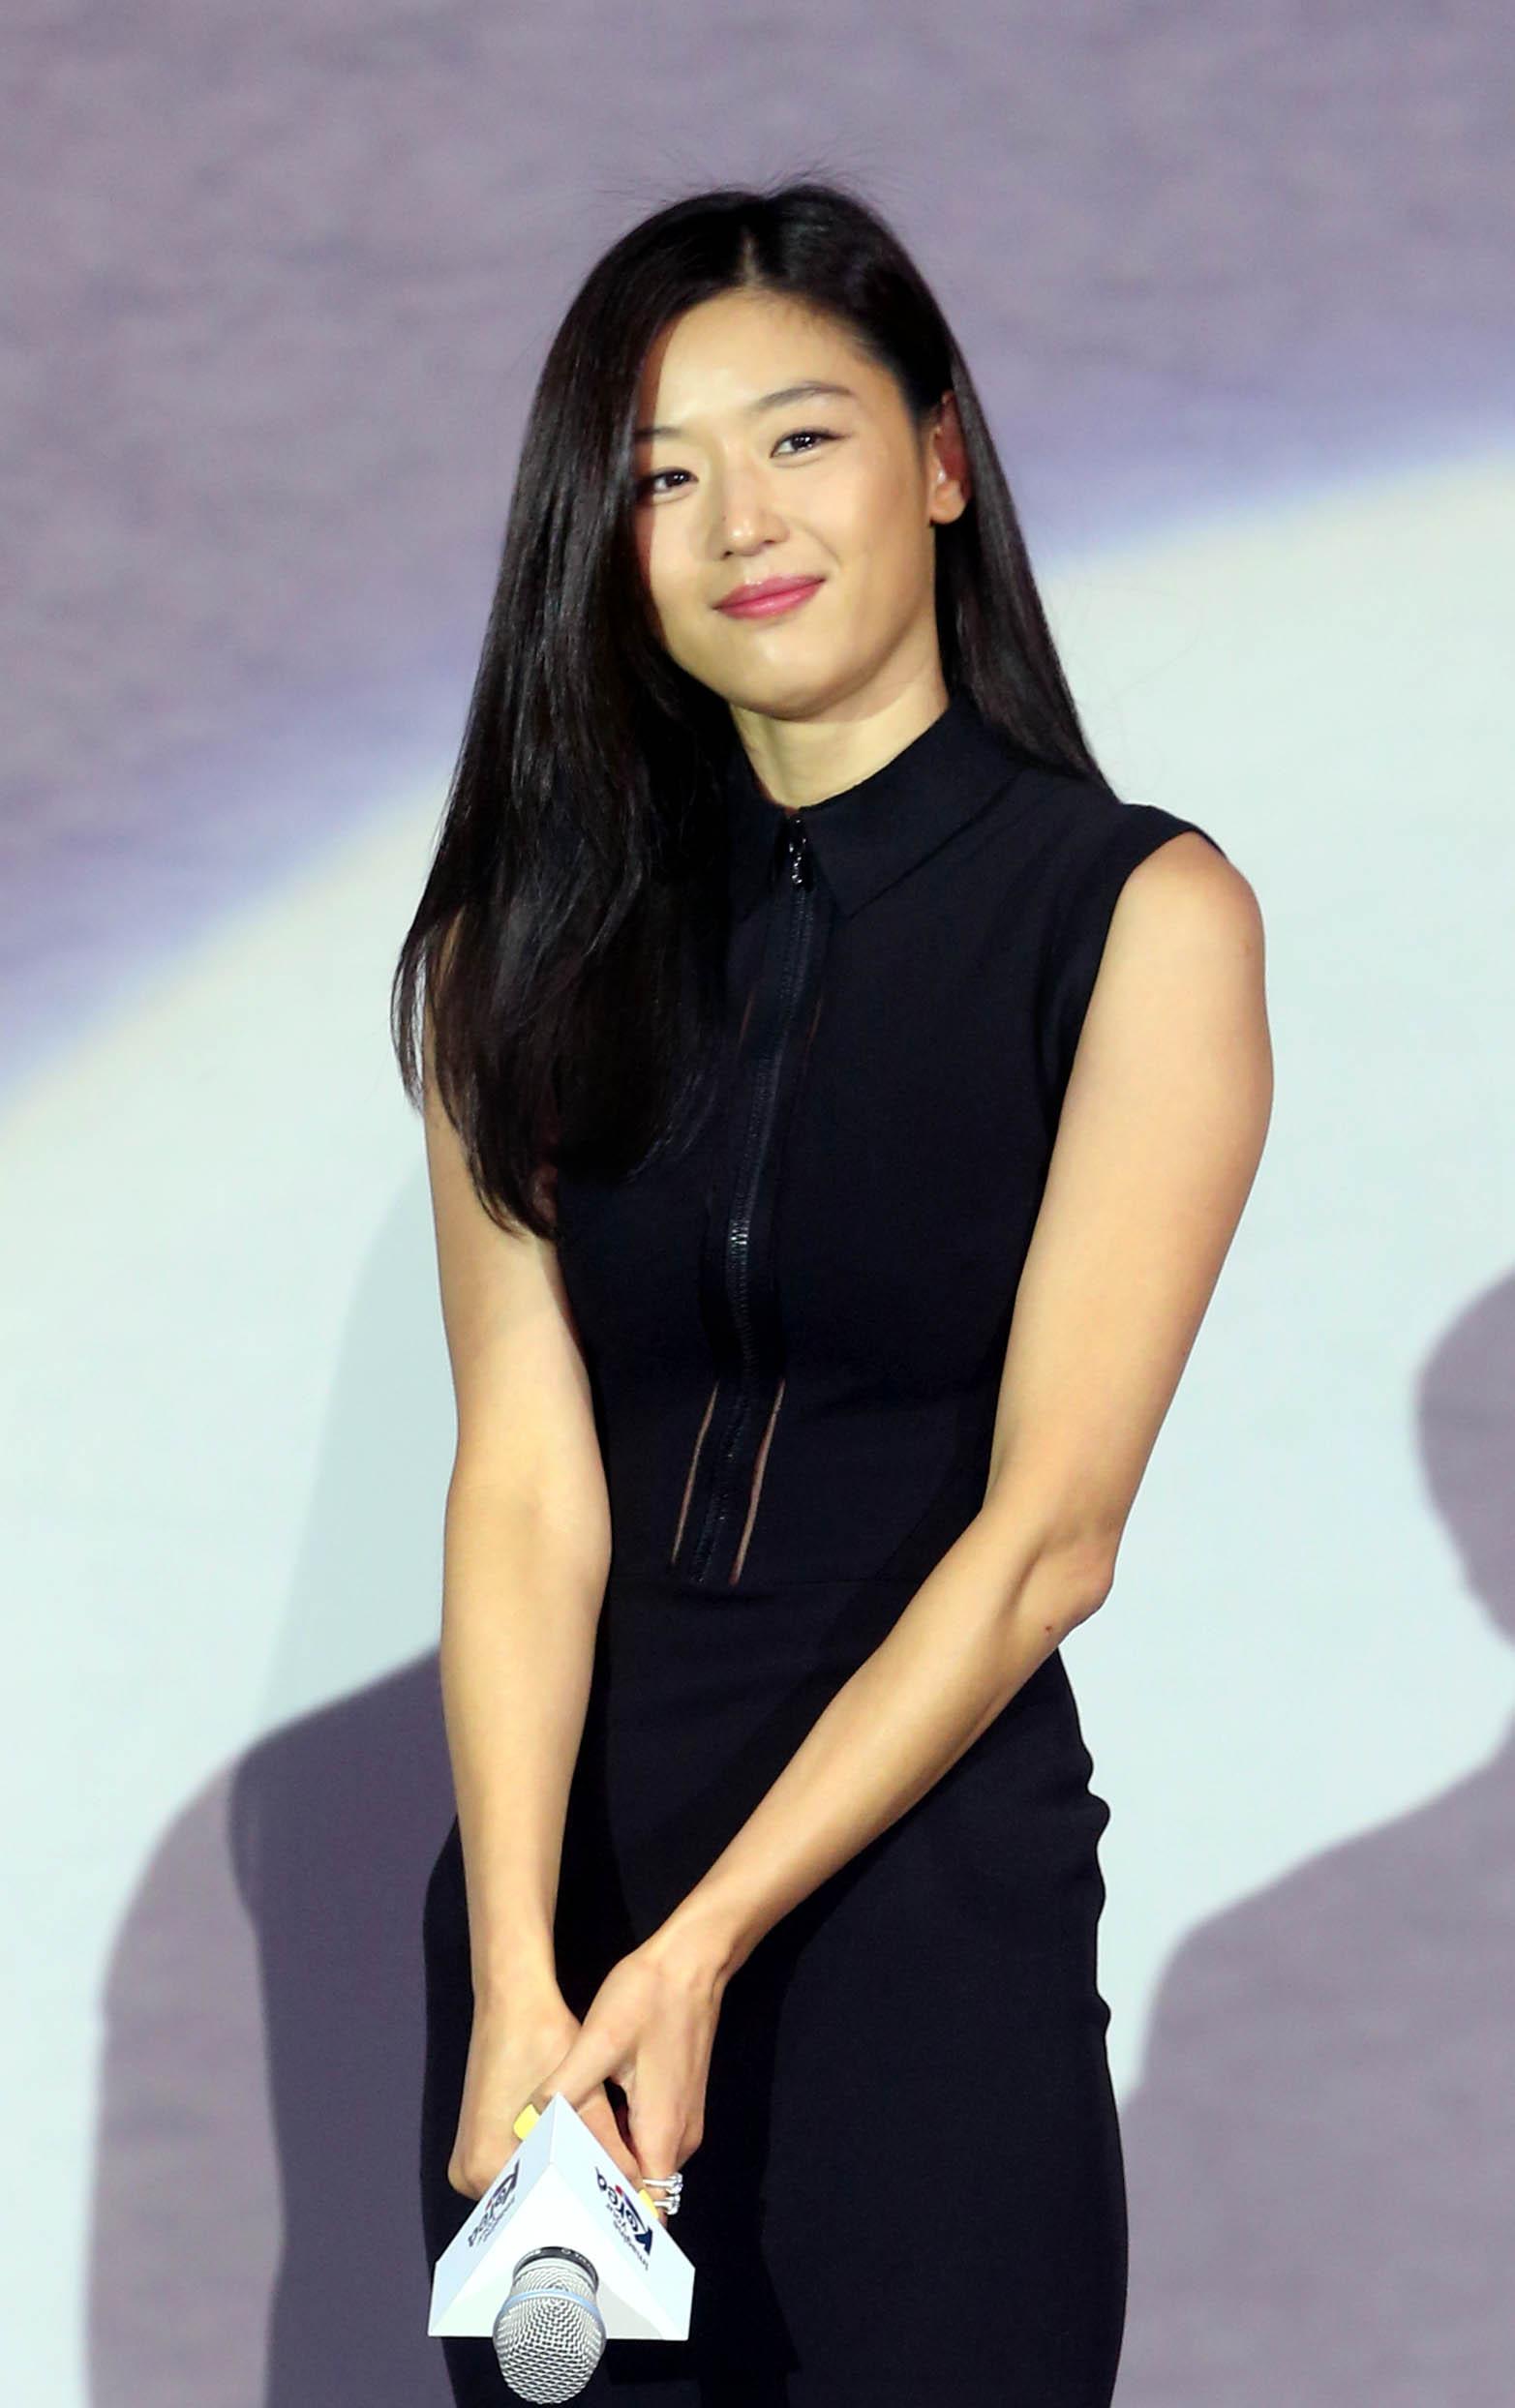 Jun Ji Hyun Korean Actress Wallpapers   HD Wallpapers   ID